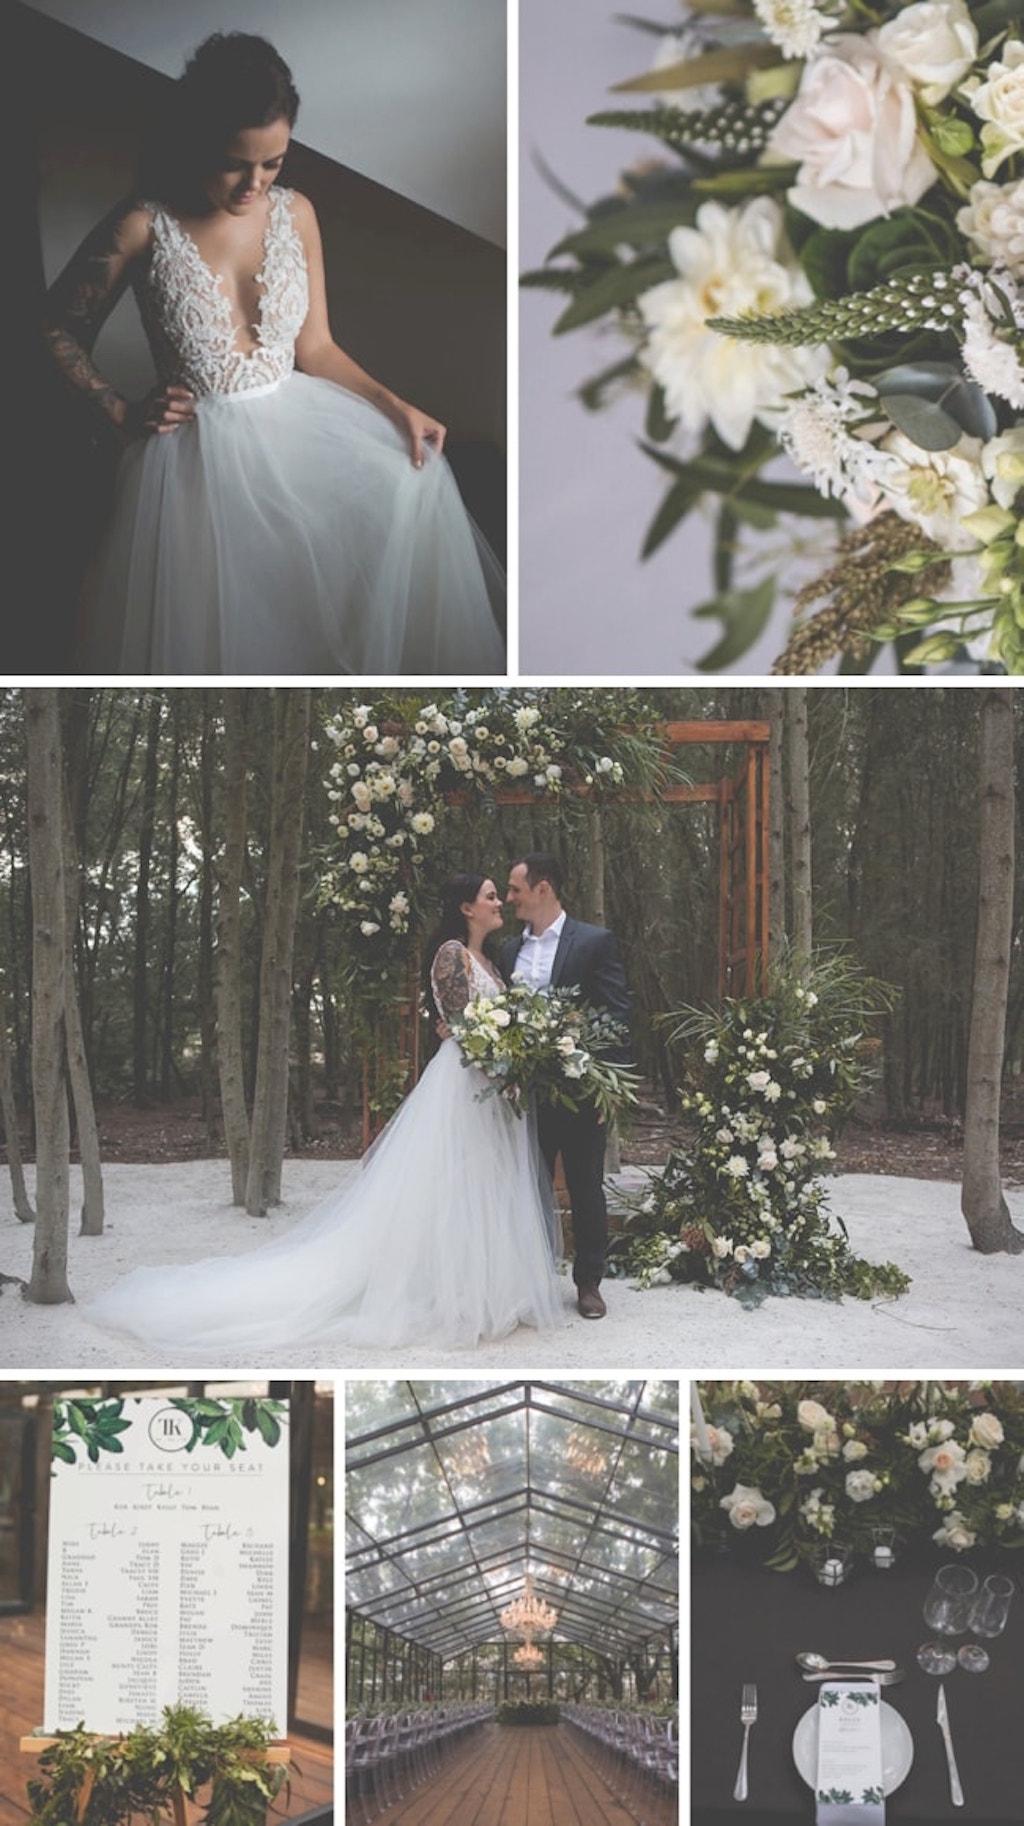 Edgy Fairytale Forest Wedding at Die Woud by Nikki van Diermen   SouthBound Bride